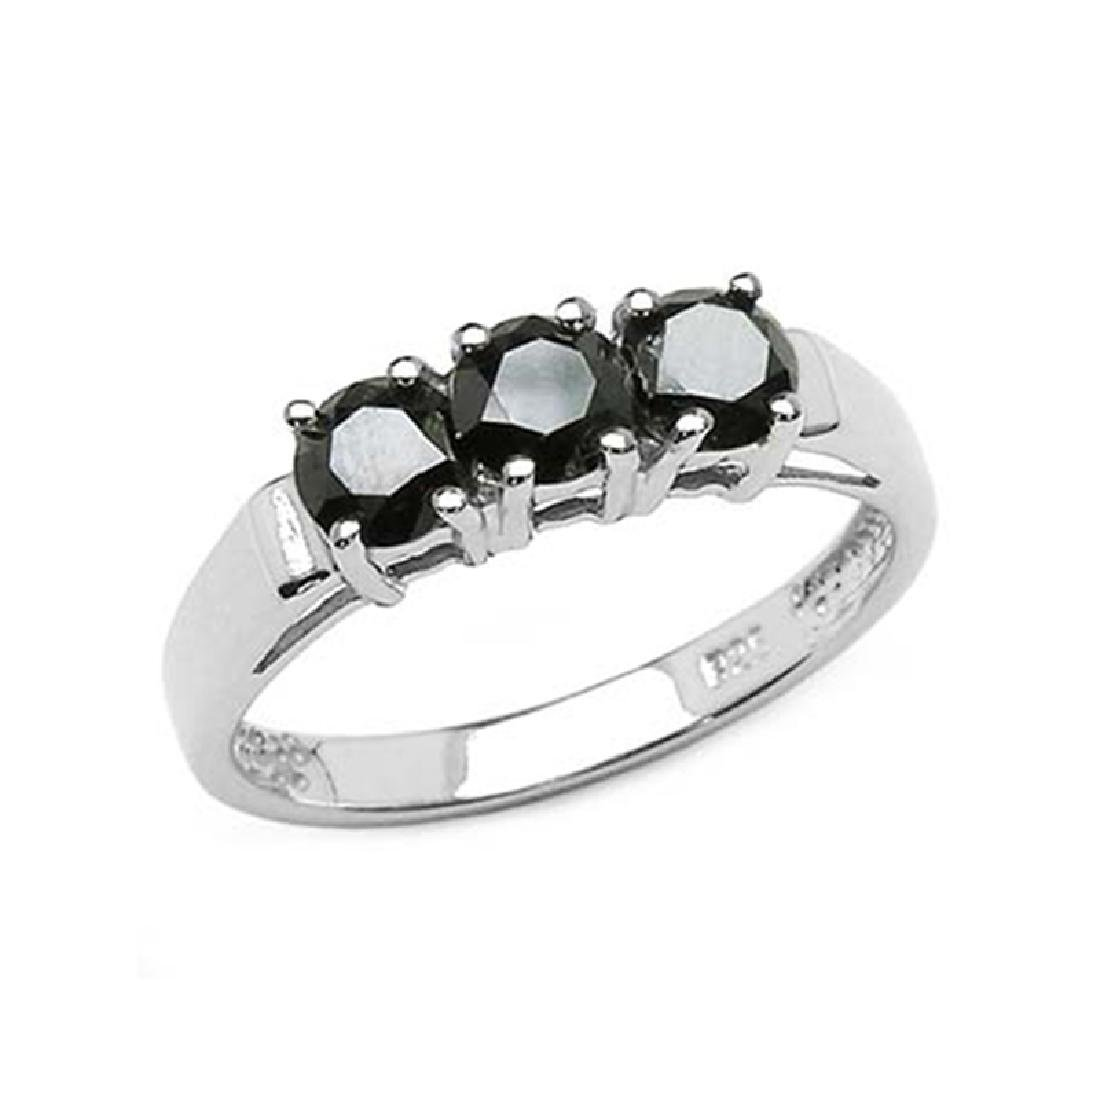 *Fine Jewelry 1.19CT Round Cut Black Diamond And